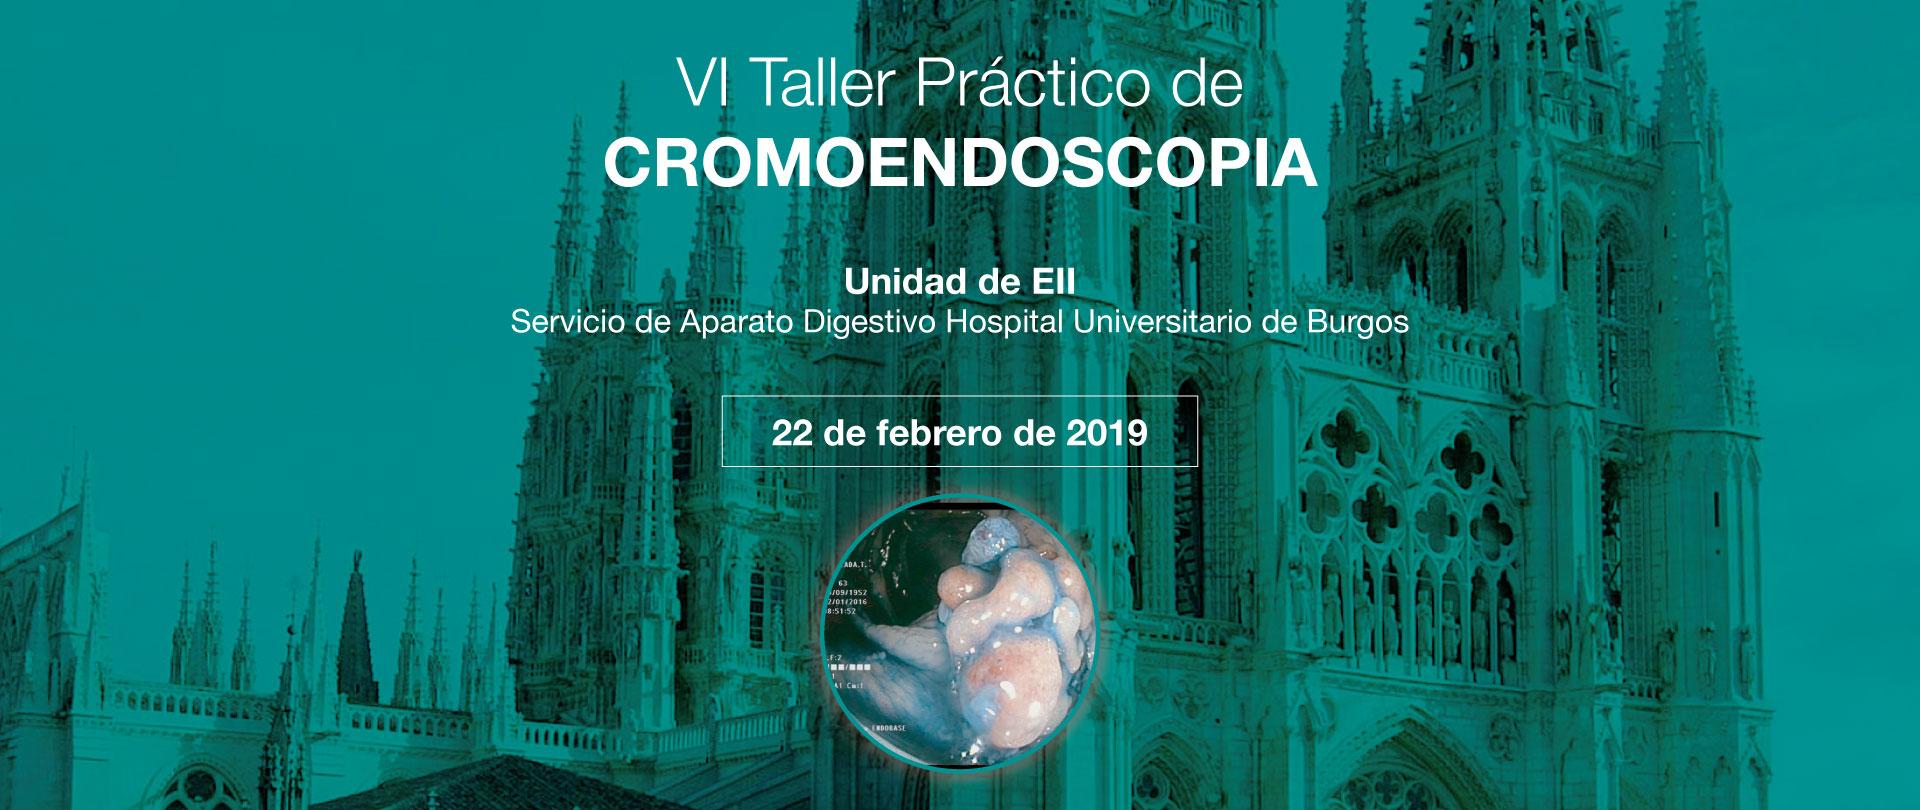 VI Taller Práctico de Cromoendoscopia